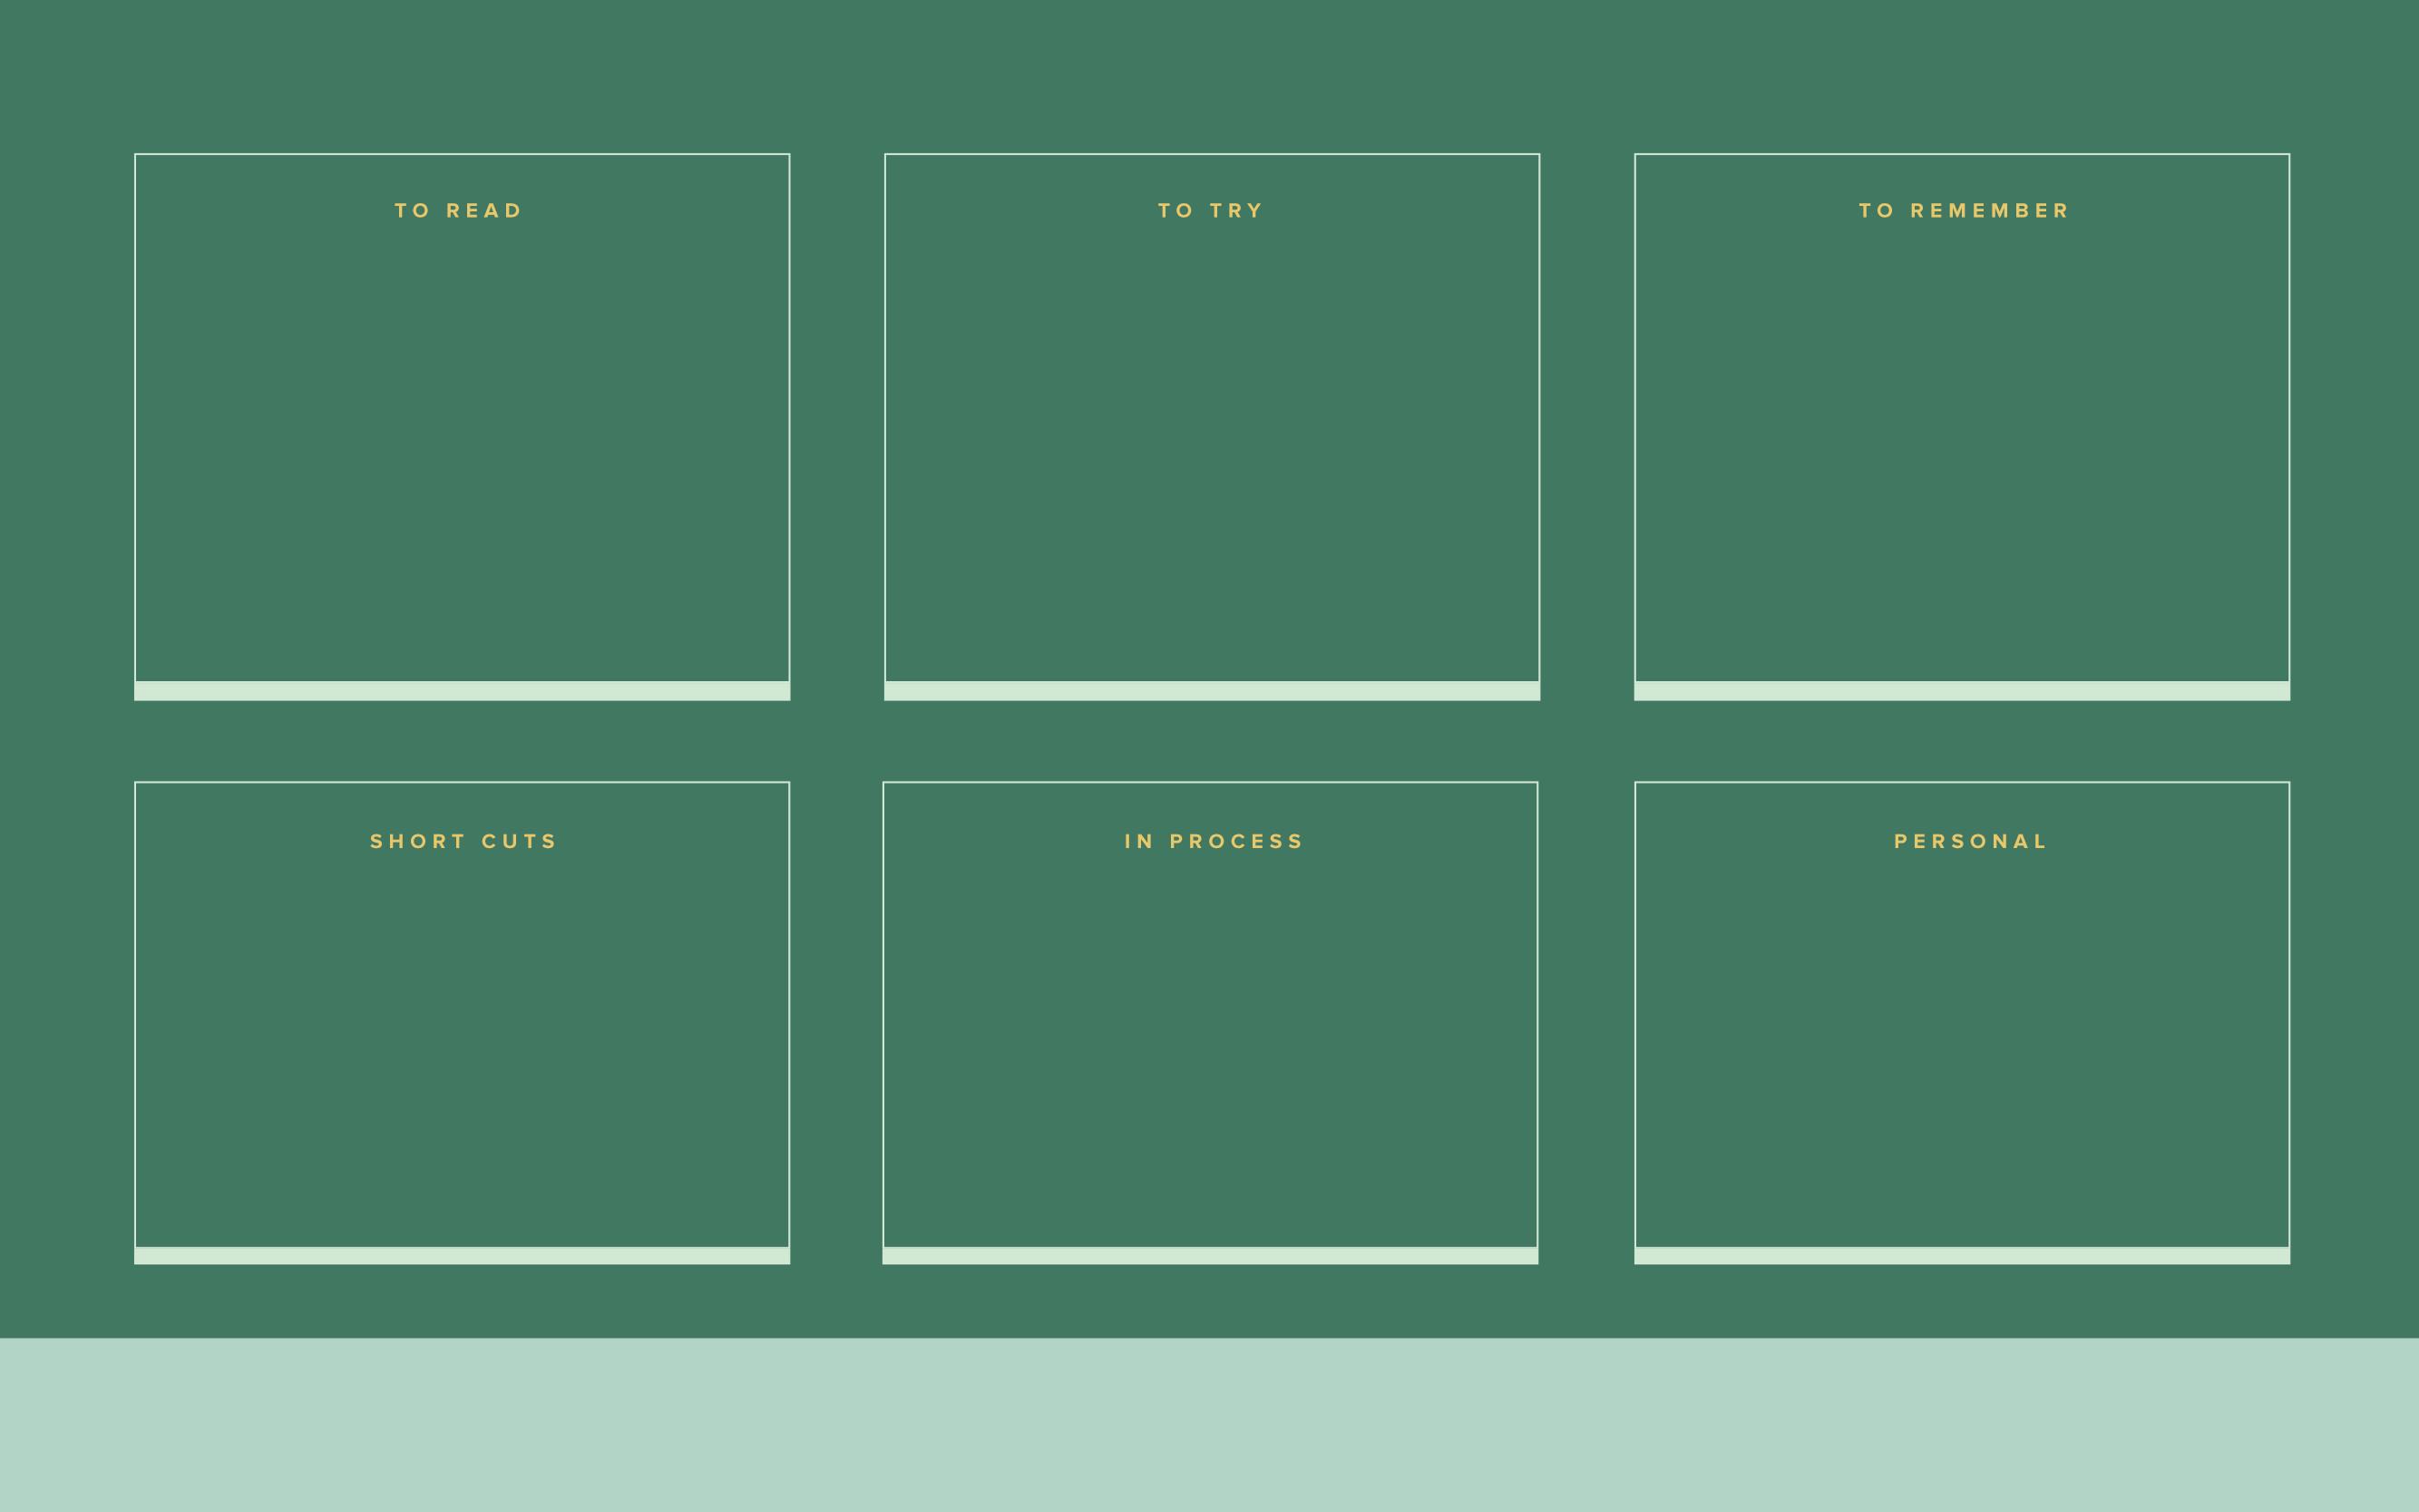 … desktop organizer wallpaper lifehacker tracksbrewpubbrampton com;  computer …